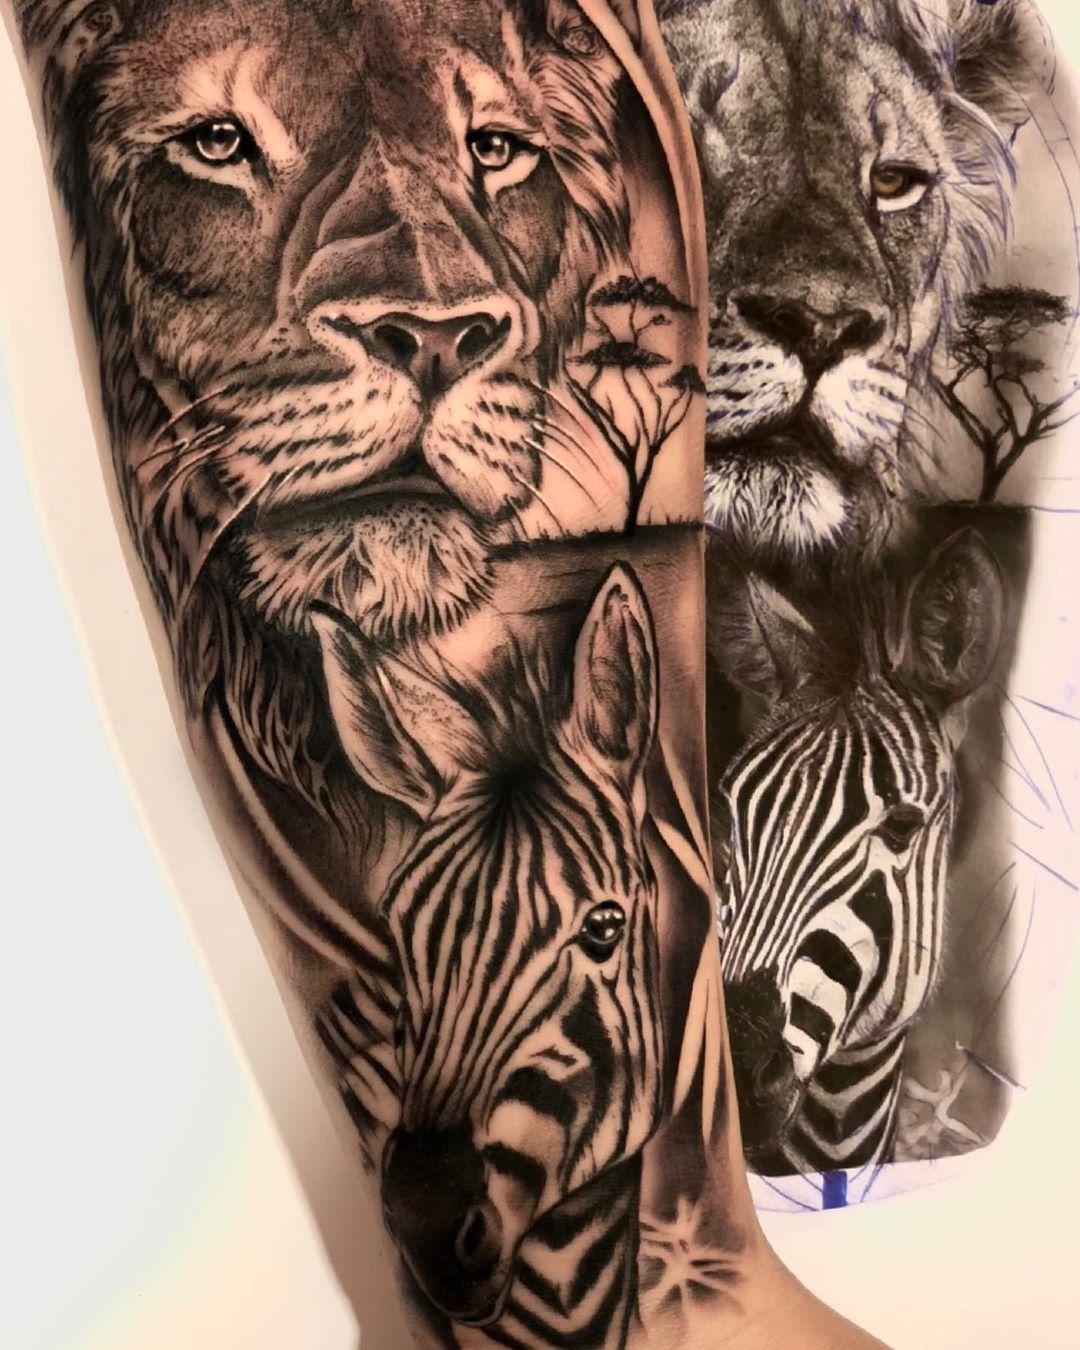 realismtattoo,followforfollow,berlin,followmeciudadreal,ciudadreal,tomelloso,almagro,puertollano,tatuajesenpuertollano,tatuajesendaimiel,ciudadrealtattoo,ciudadrealtatuajes,tatuajesciudadreal,follow,ciudadrealtatuajes,puertollano,tattooers,besttattooers,juantabasco,ciudadrealsetatua,ink,tatuajes,realiismo,realistictattoo,ciudadrealtattoo,tatuajesenpuertollano,traditionaltattoos,castillalamancha